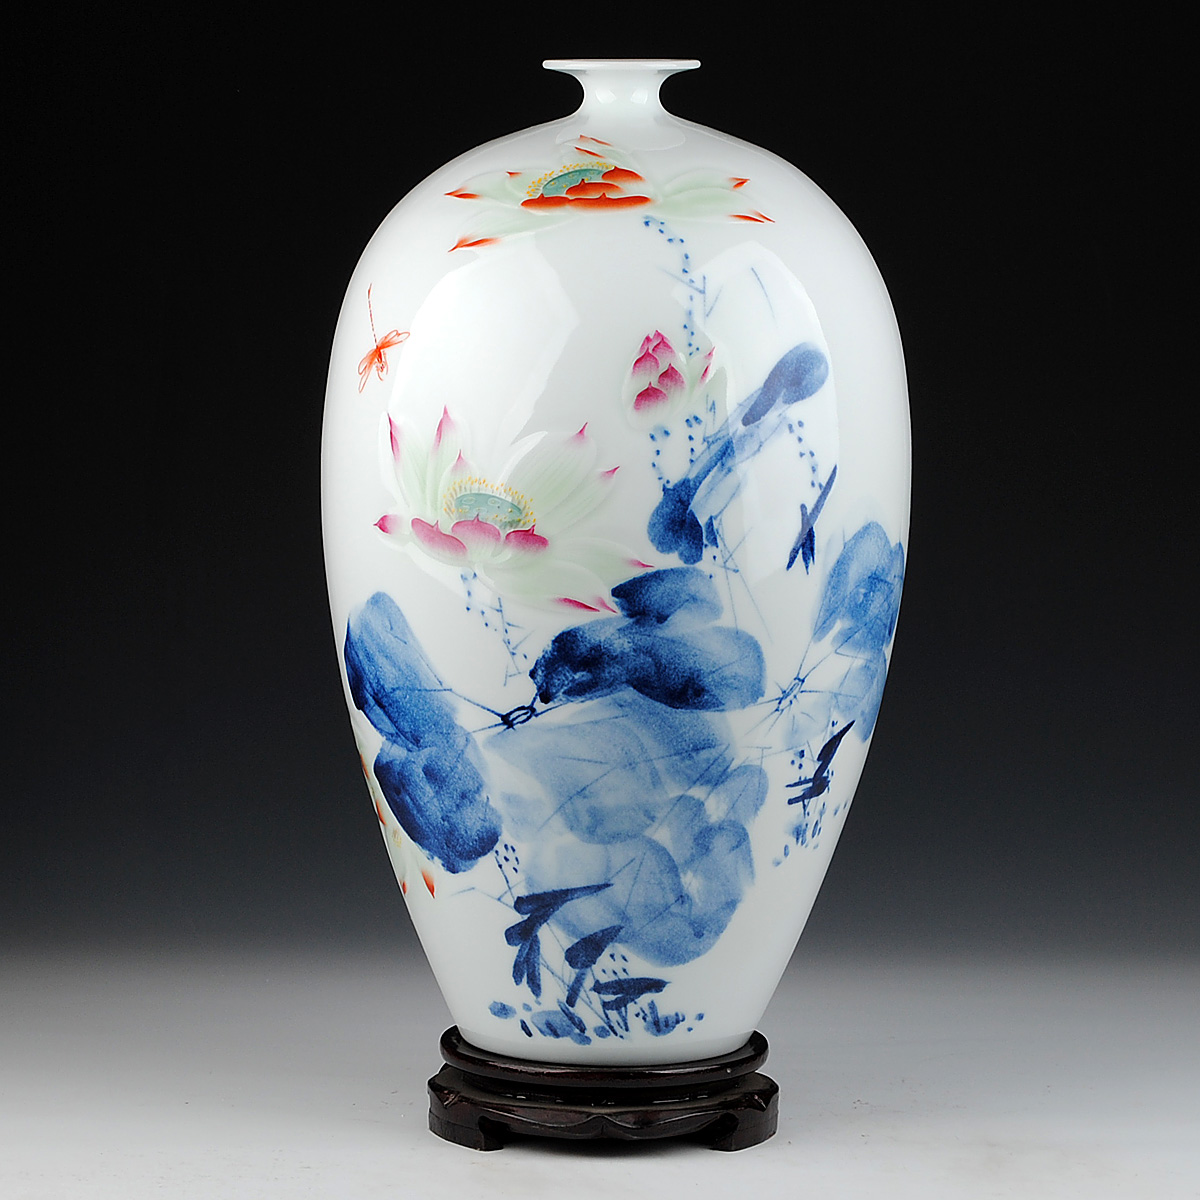 Popular Large Floor Vases Buy Cheap Large Floor Vases Lots From China Large Floor Vases